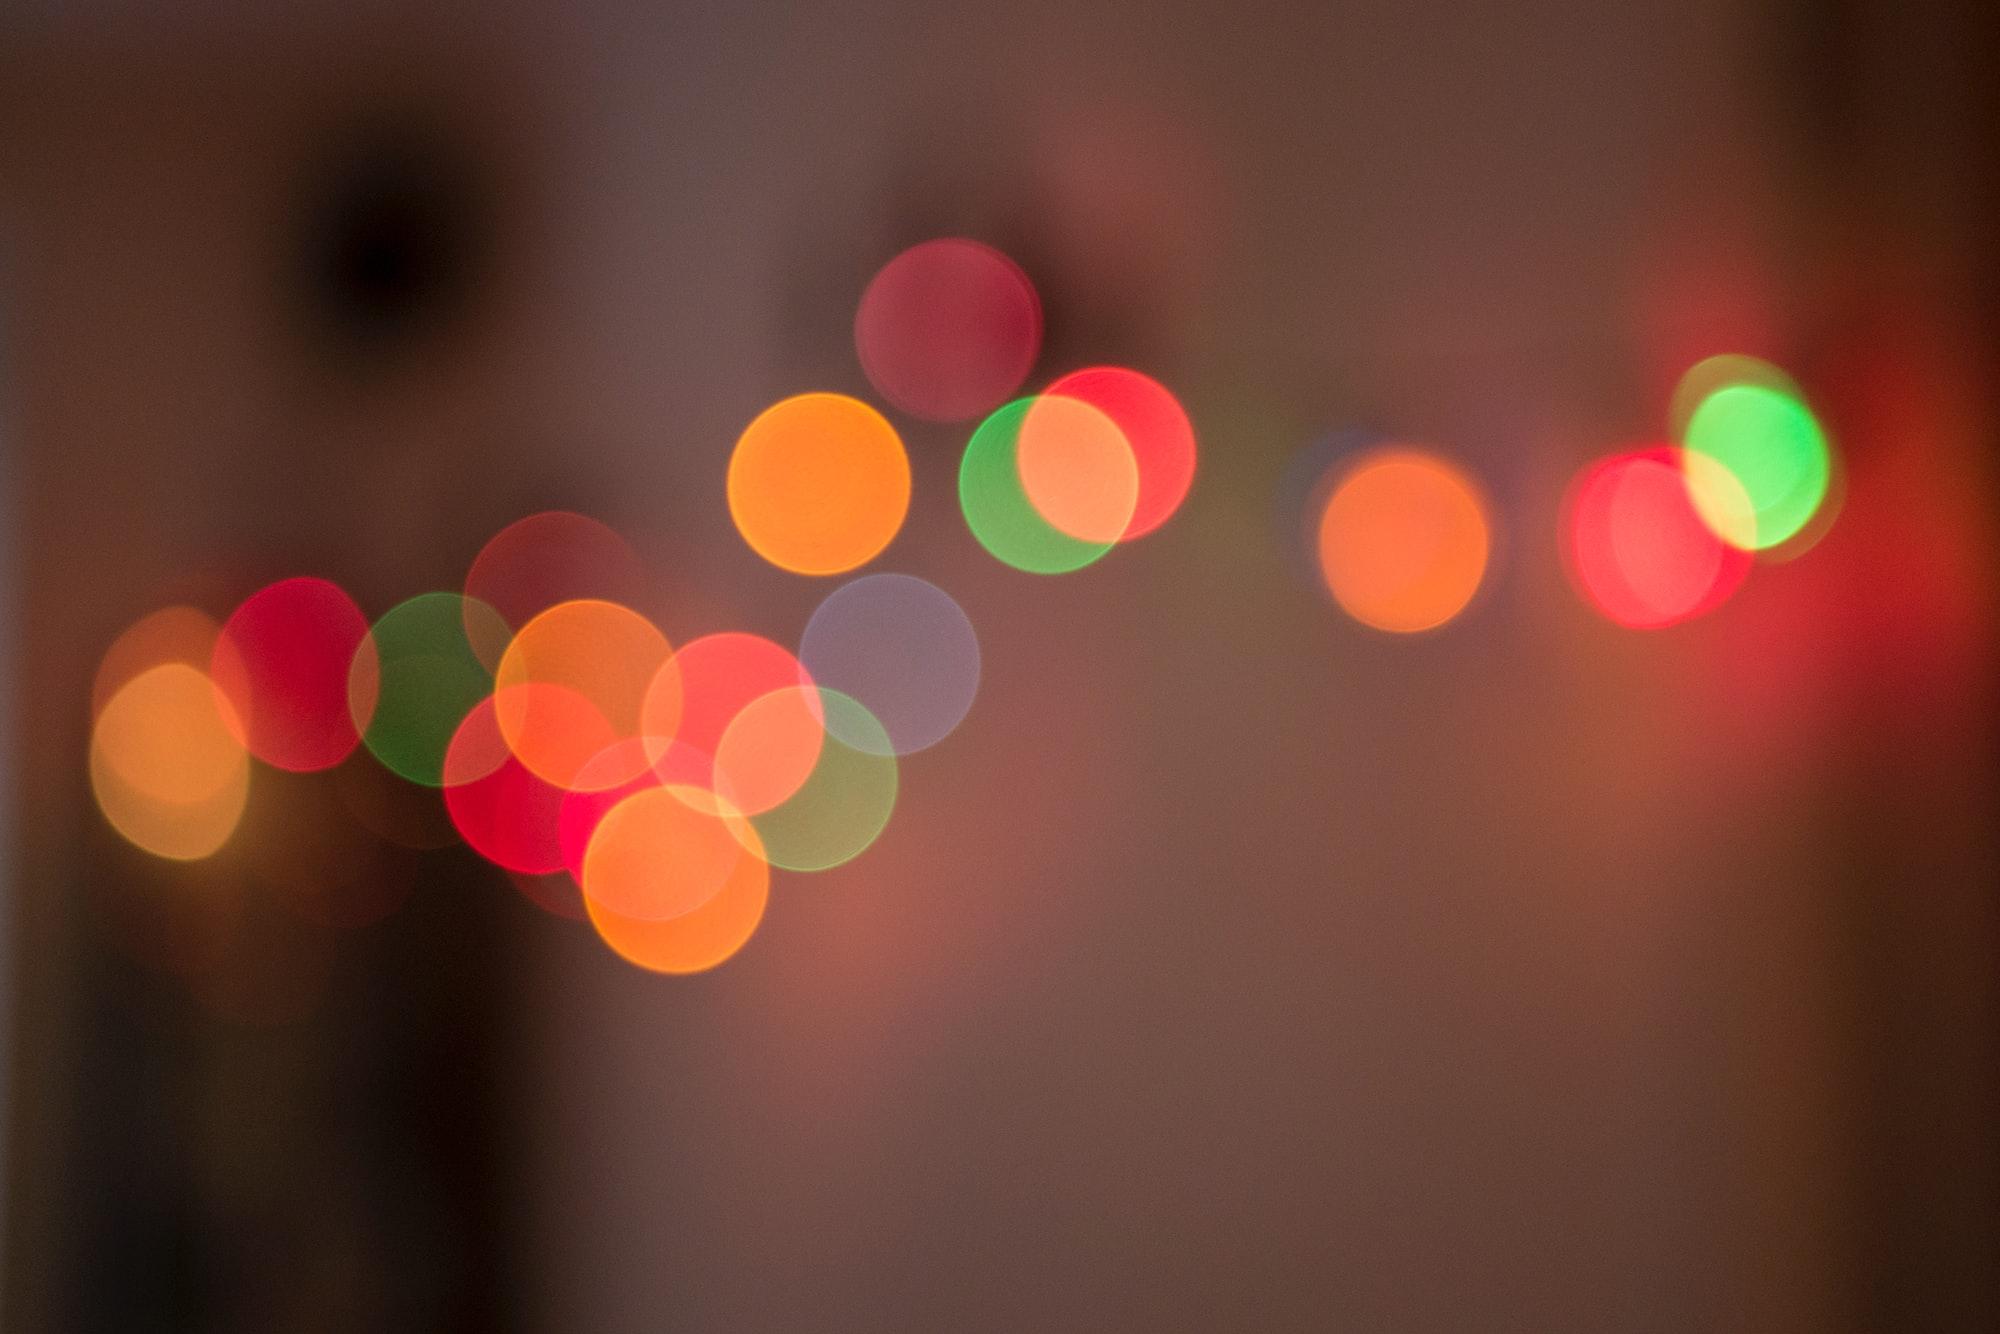 Row of Dots